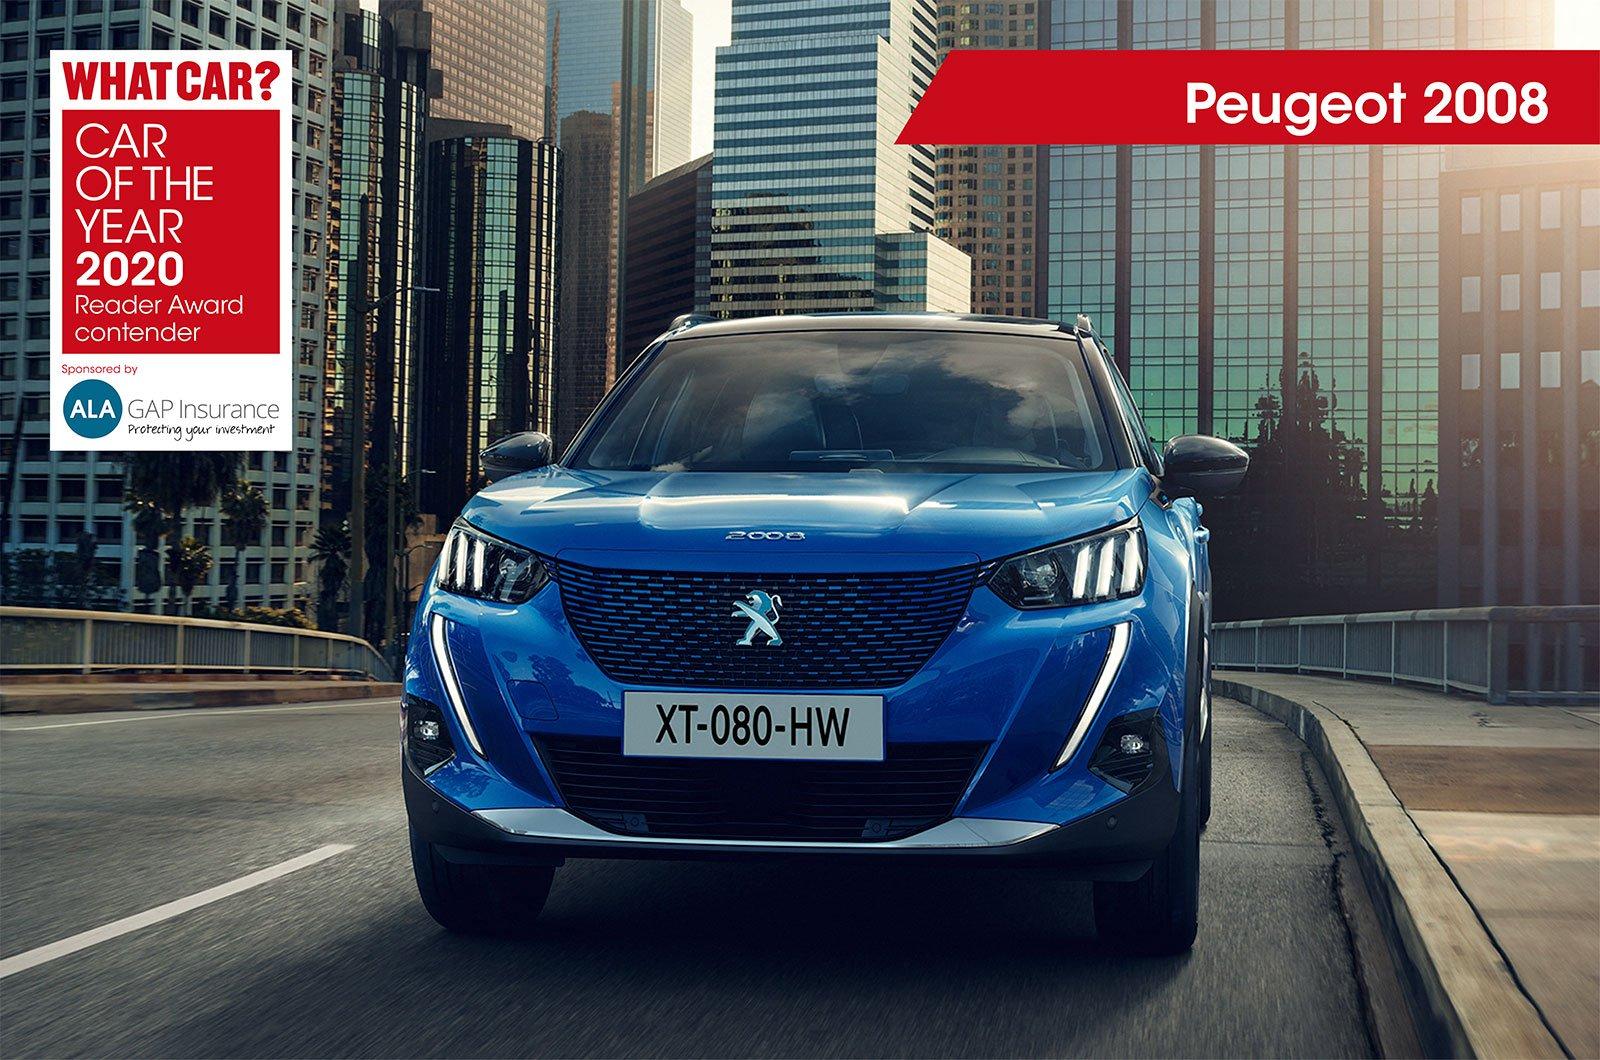 Peugeot 2008 Reader Award